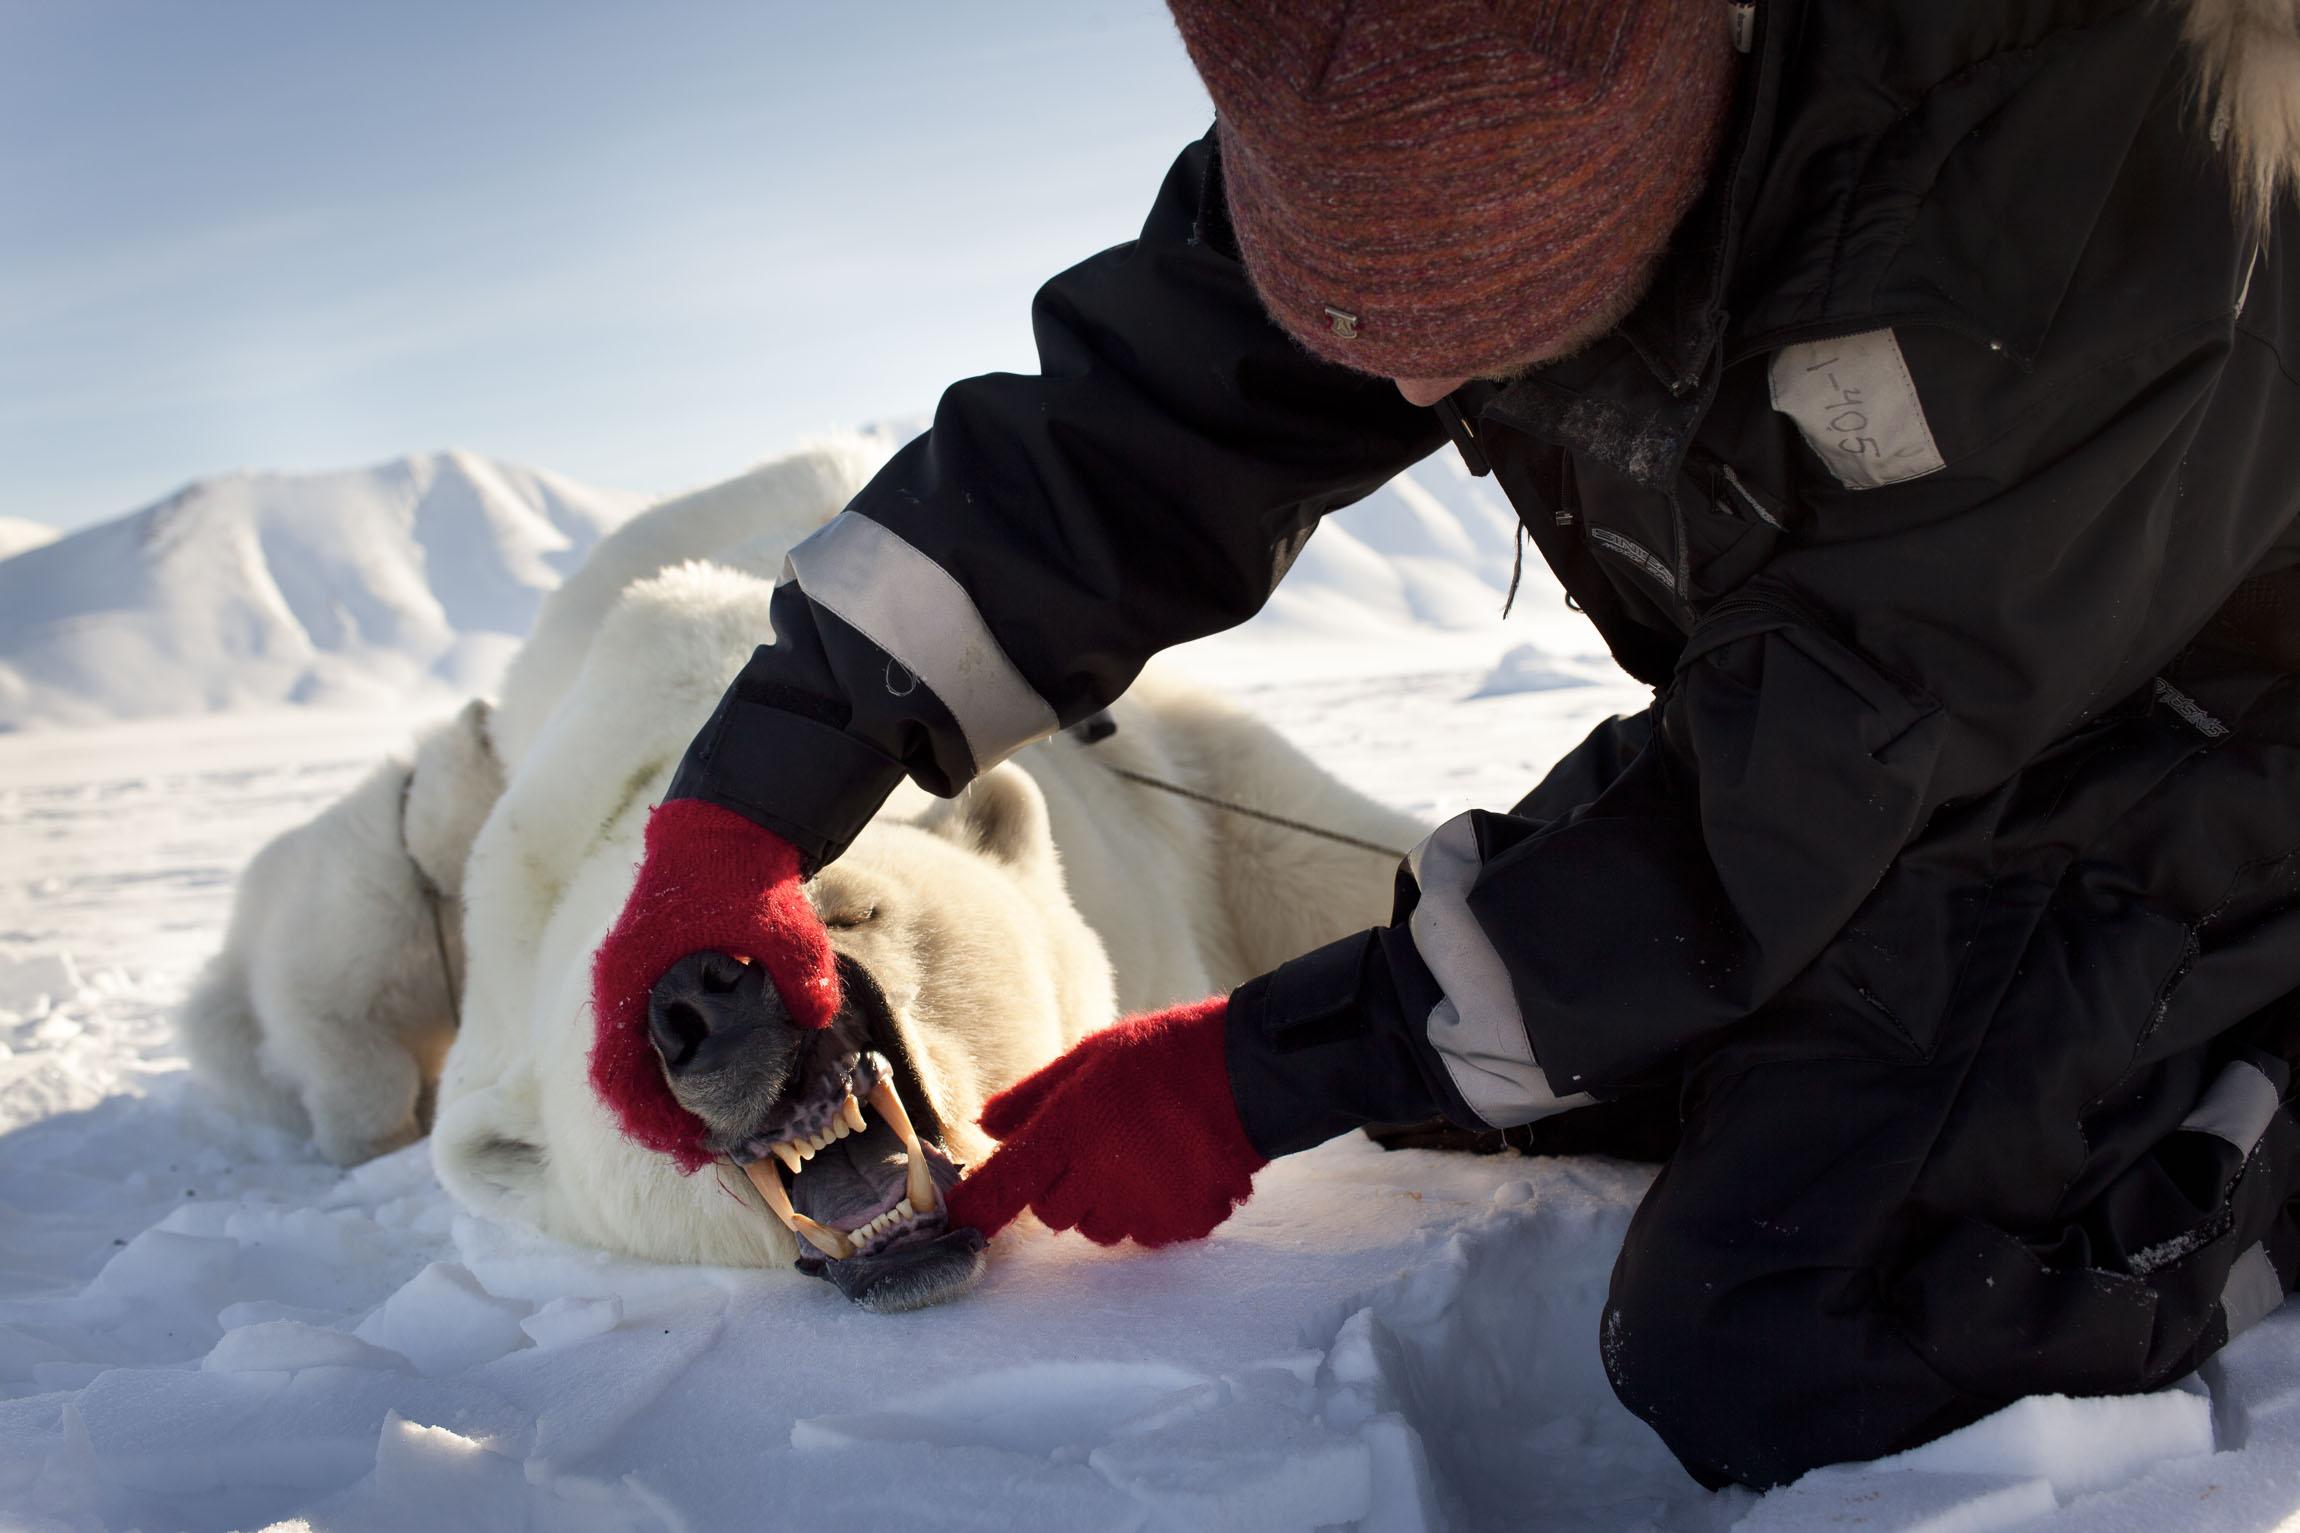 Scientist examines the teeth of a tranquilised polar bear